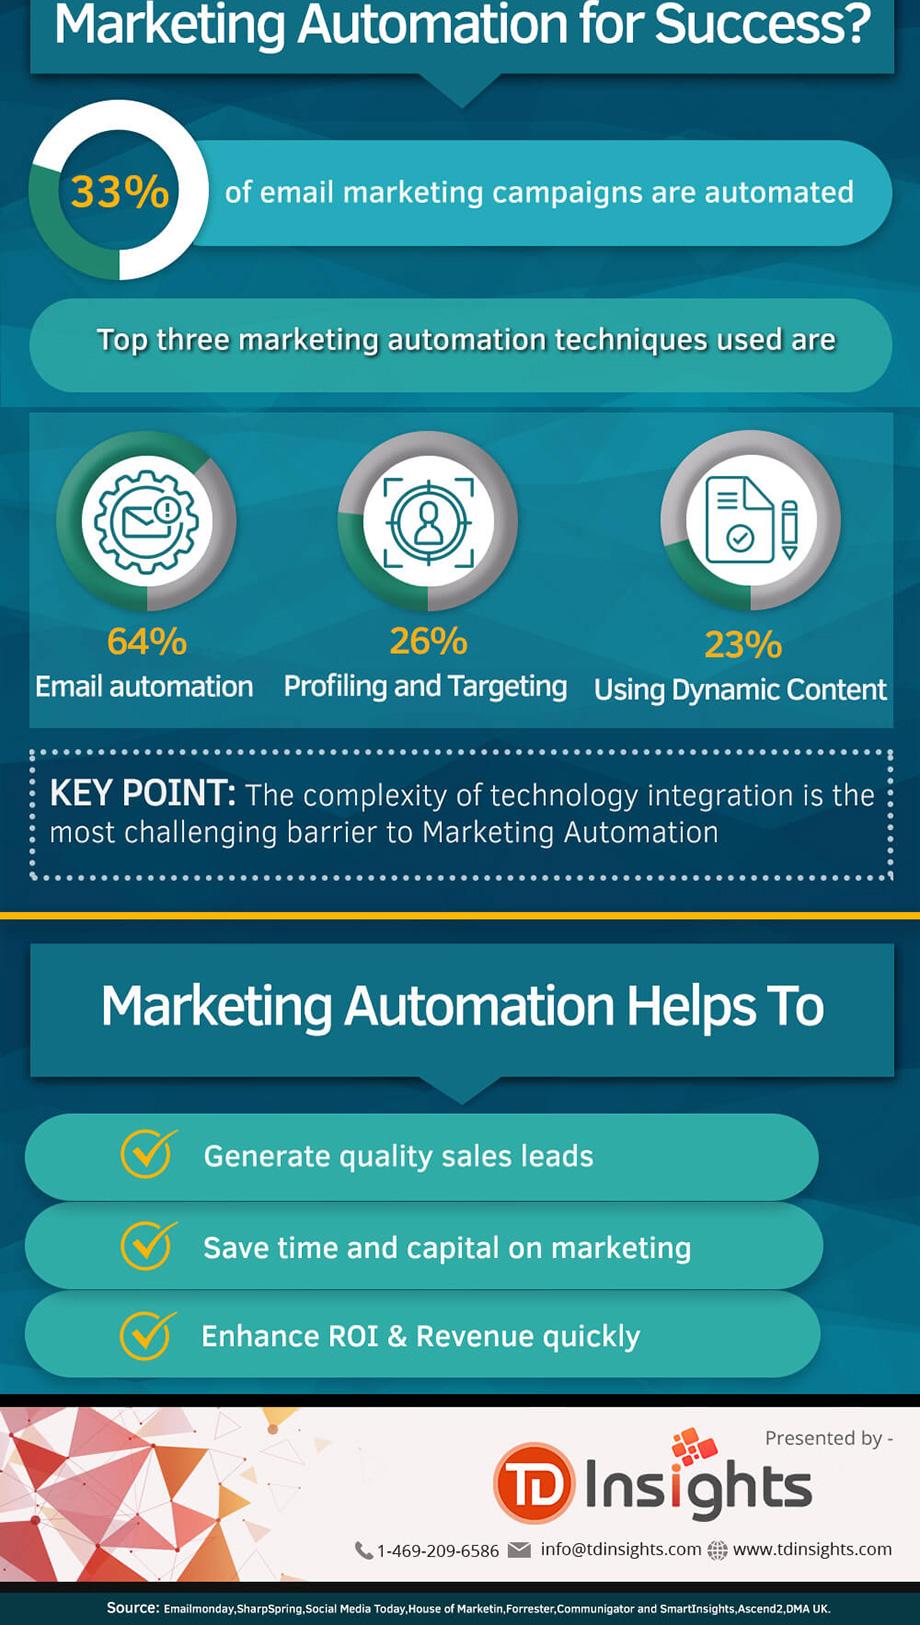 b2b-marketing-automation-role-infographic-5